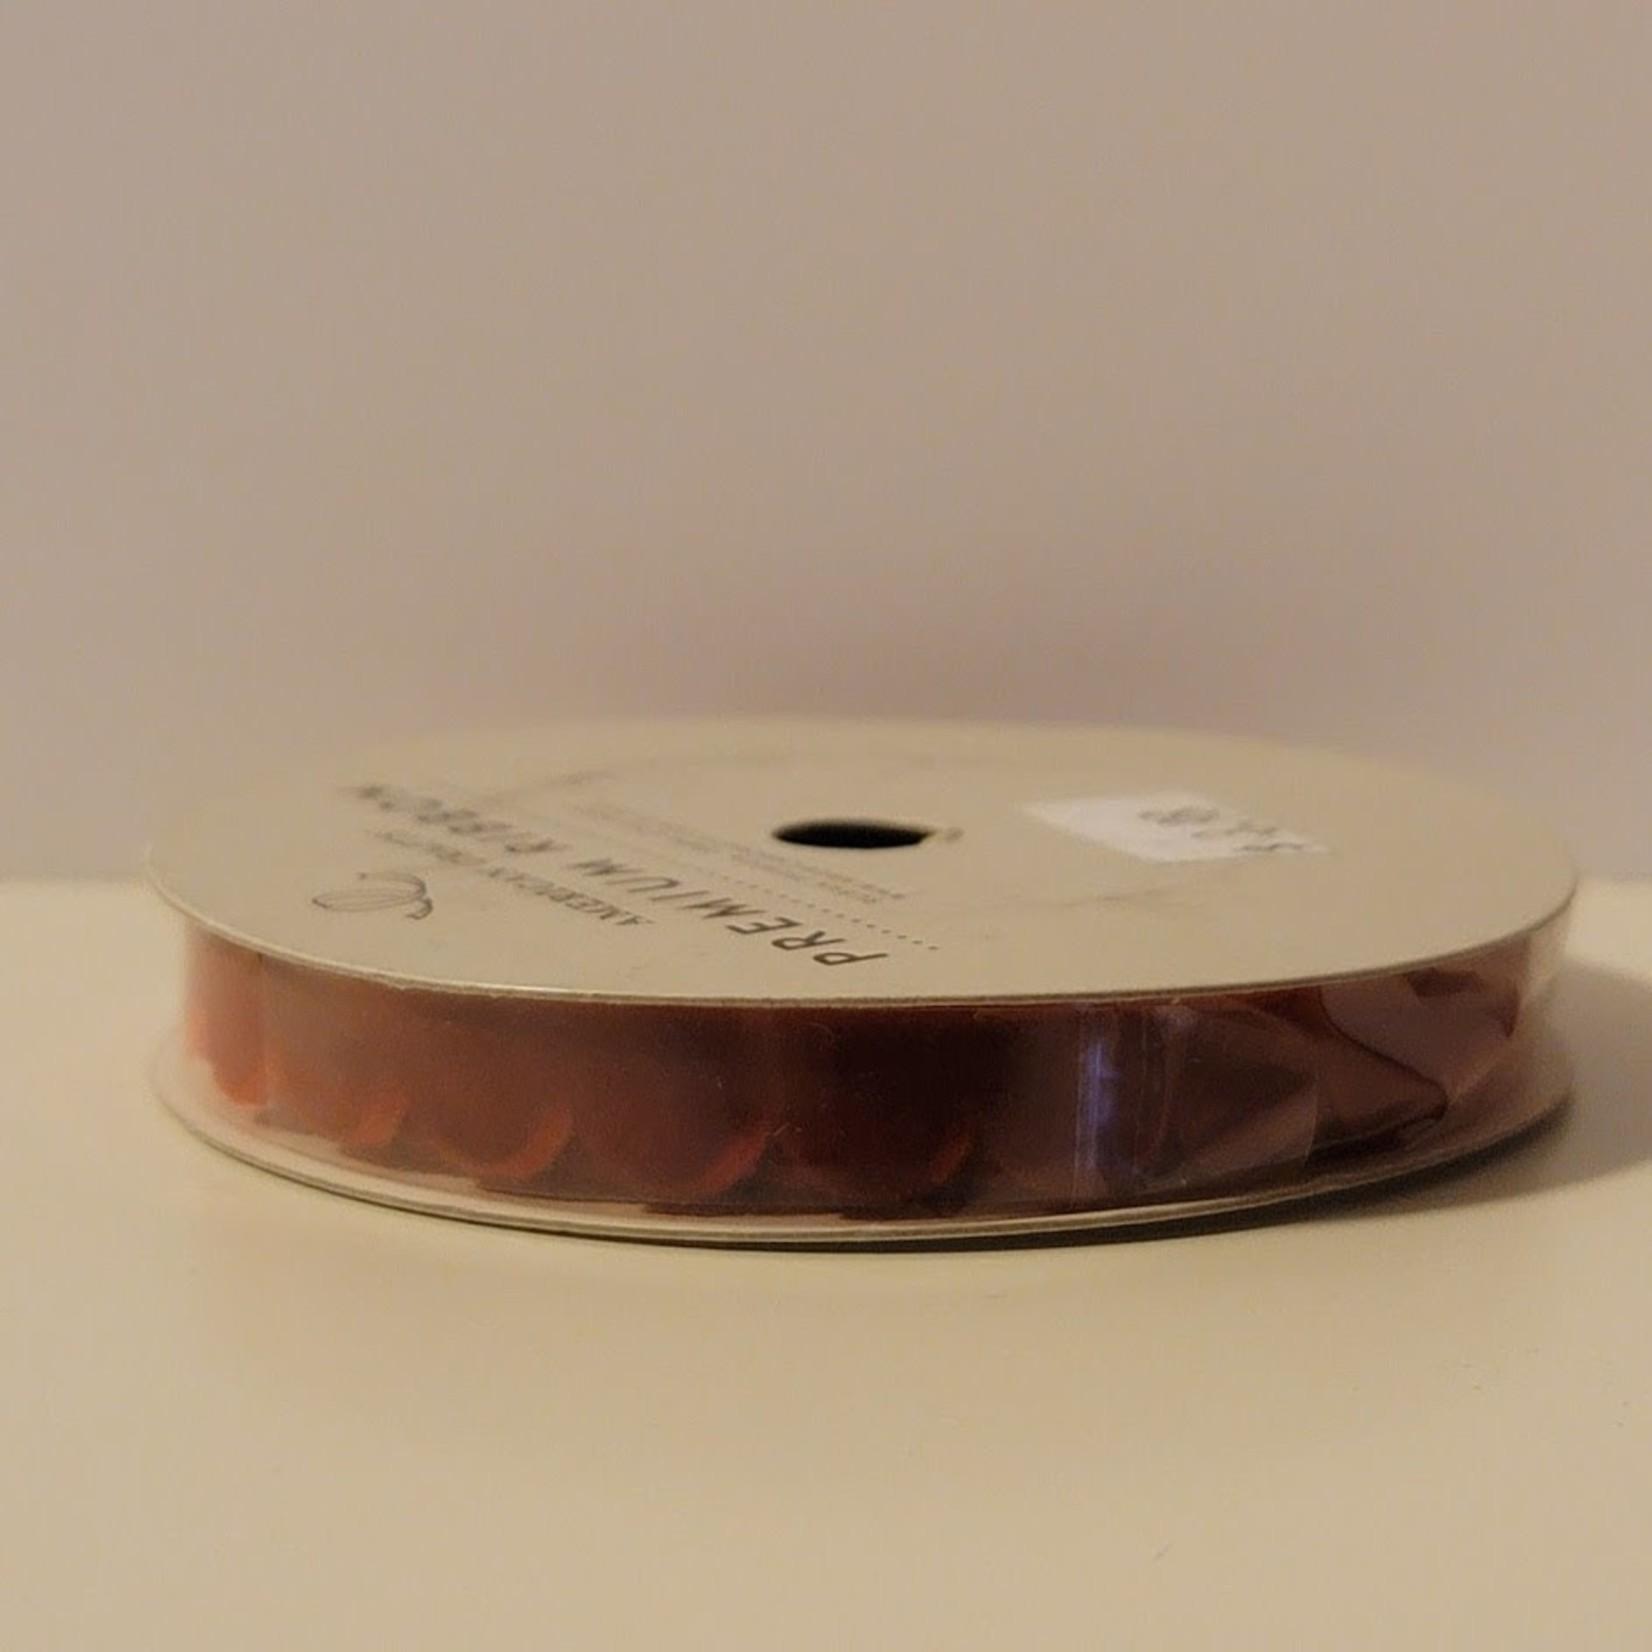 American Crafts American Crafts-Premium Ribbon-Ruban Premium, Pomegranate